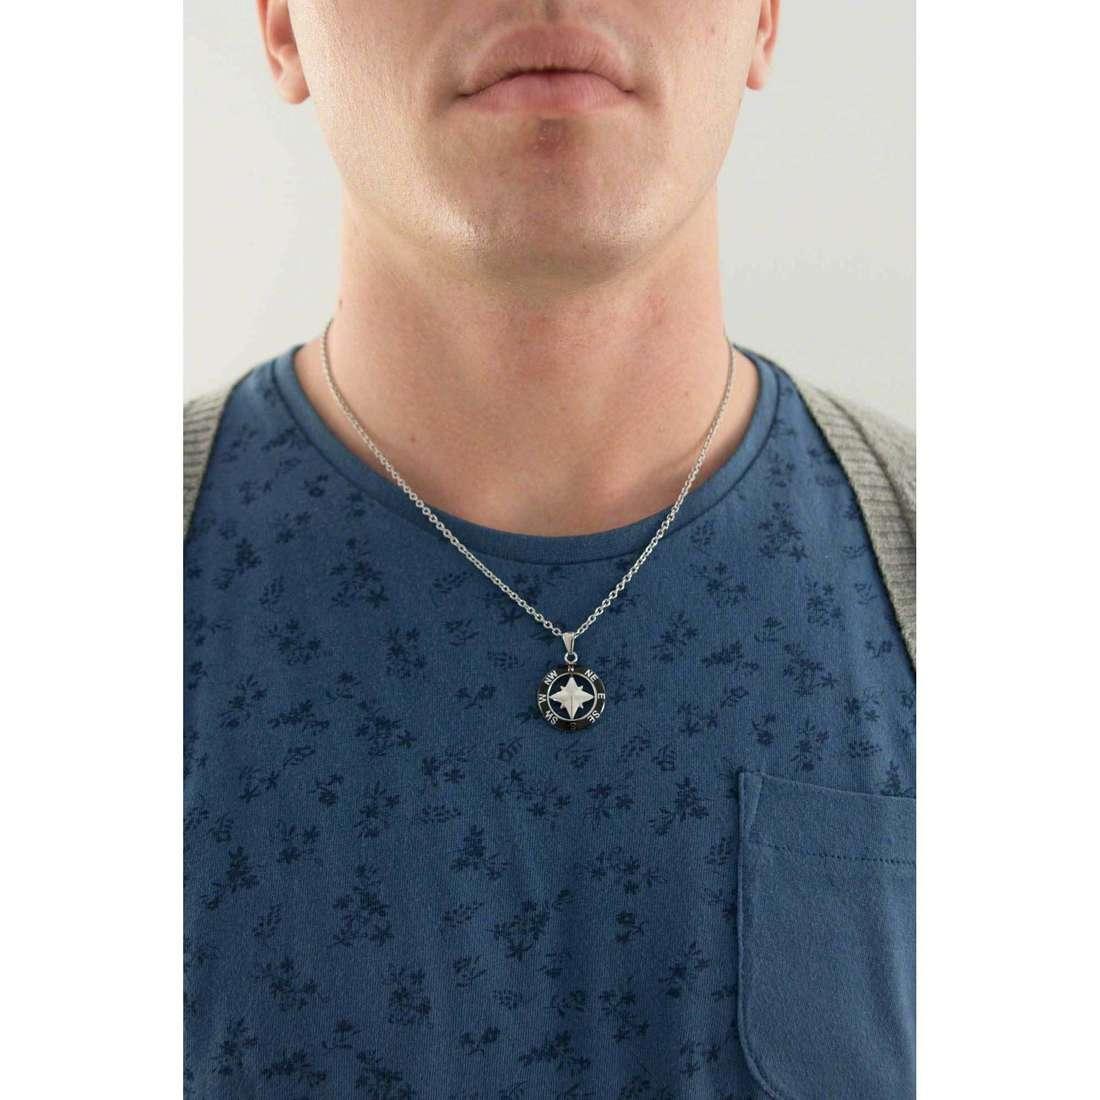 Sector necklaces Marine man SADQ02 indosso